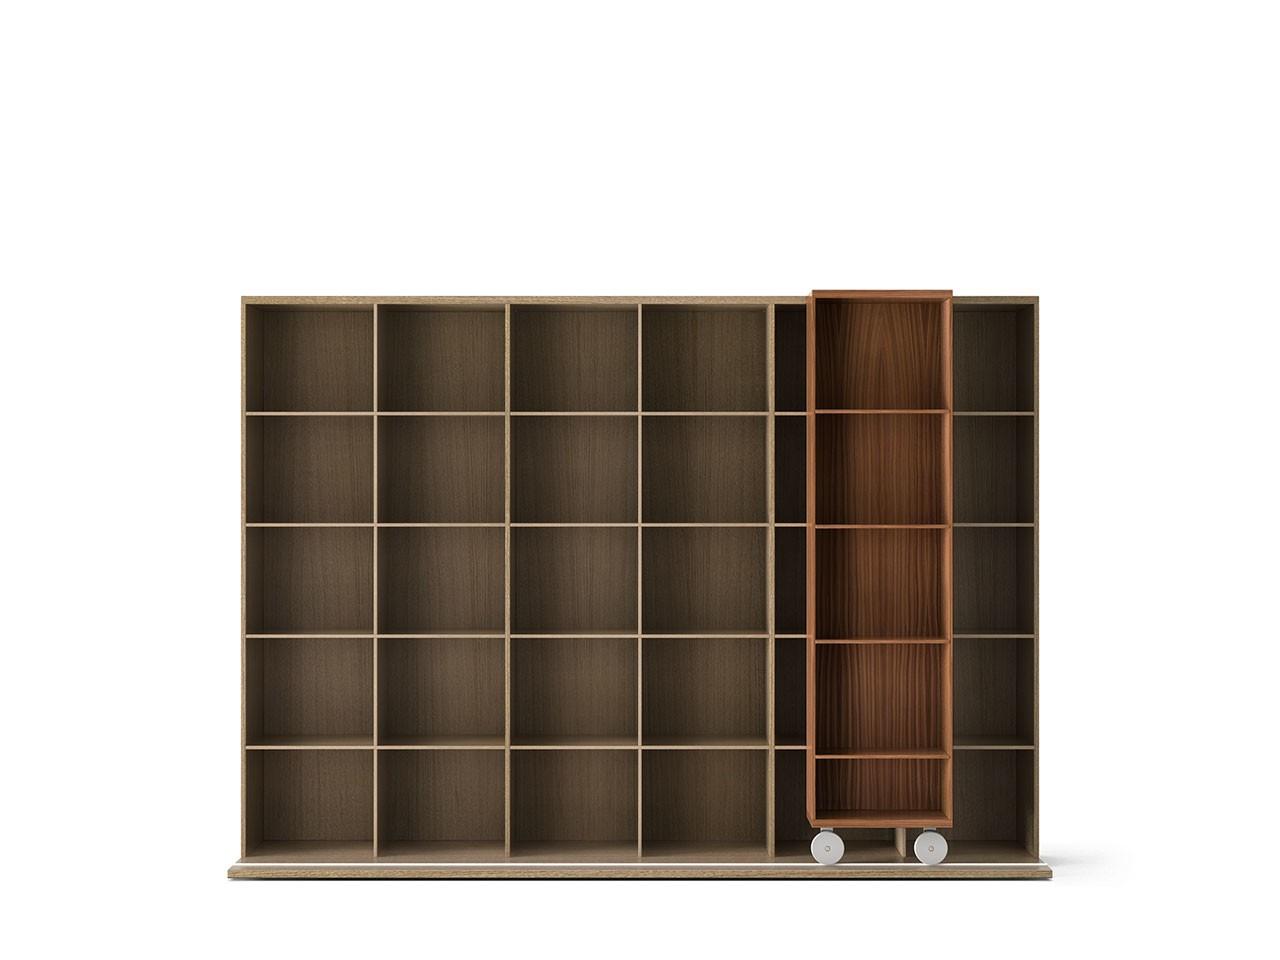 LTL430 Literatura Light Bookcase Super-matt Walnut, Whitened Oak